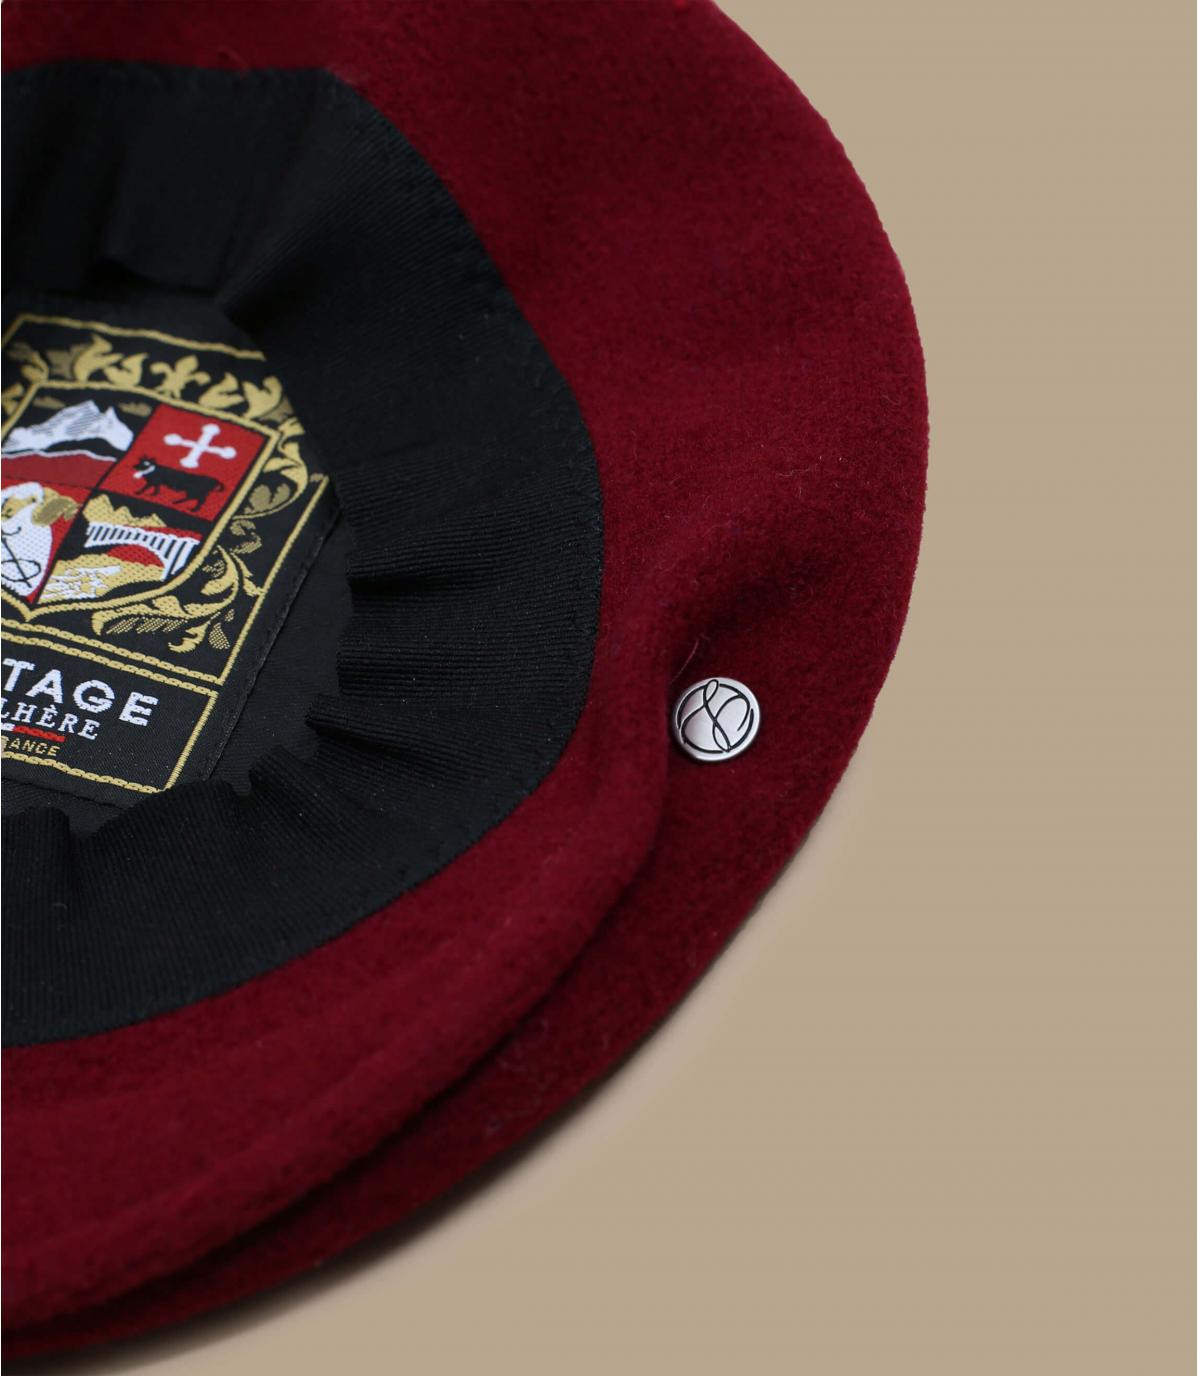 Details Flatcap 1840 bordeaux - Abbildung 3